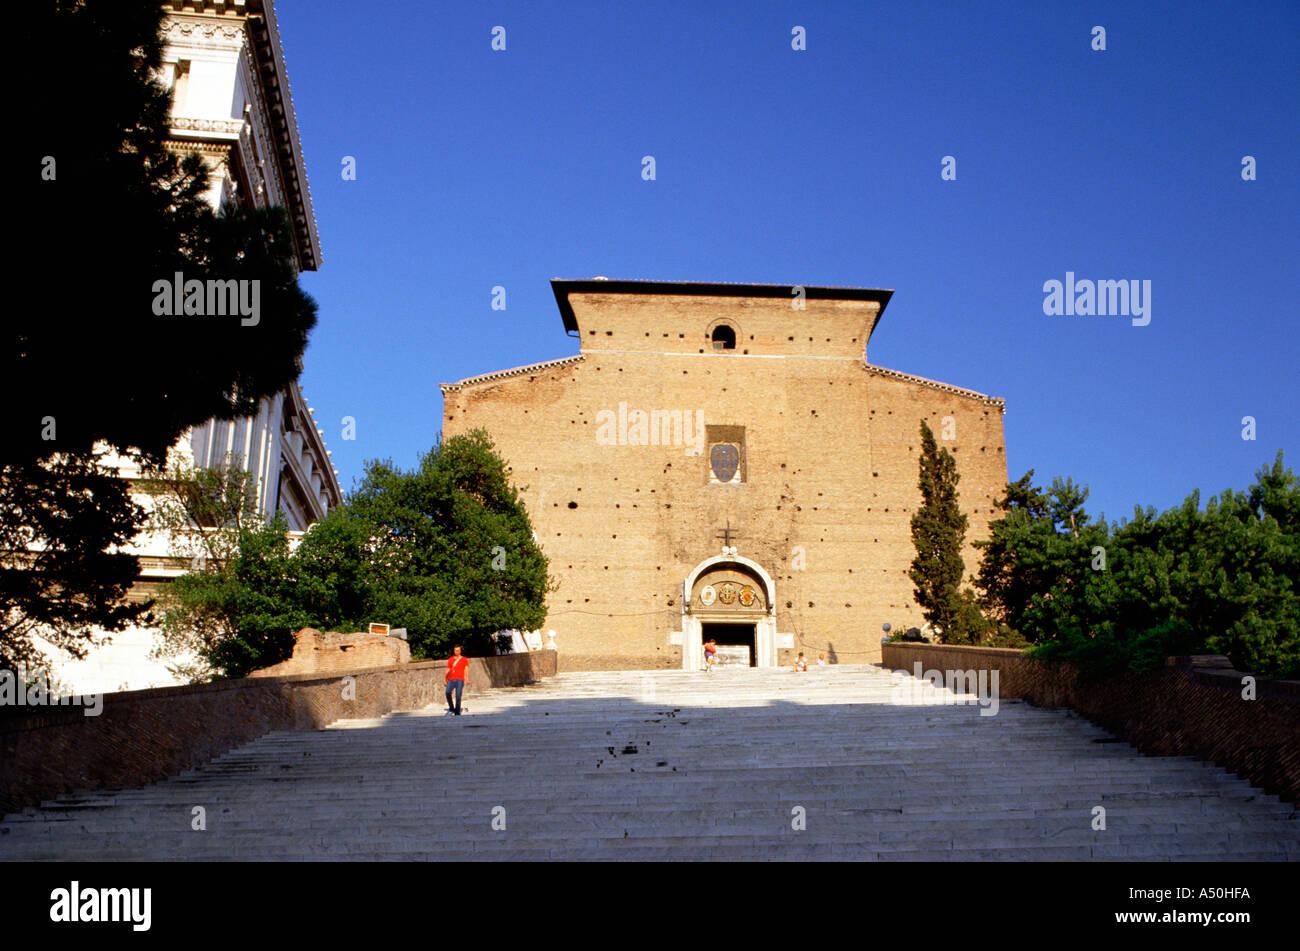 Rome Italian Stock Photos & Rome Italian Stock Images - Alamy